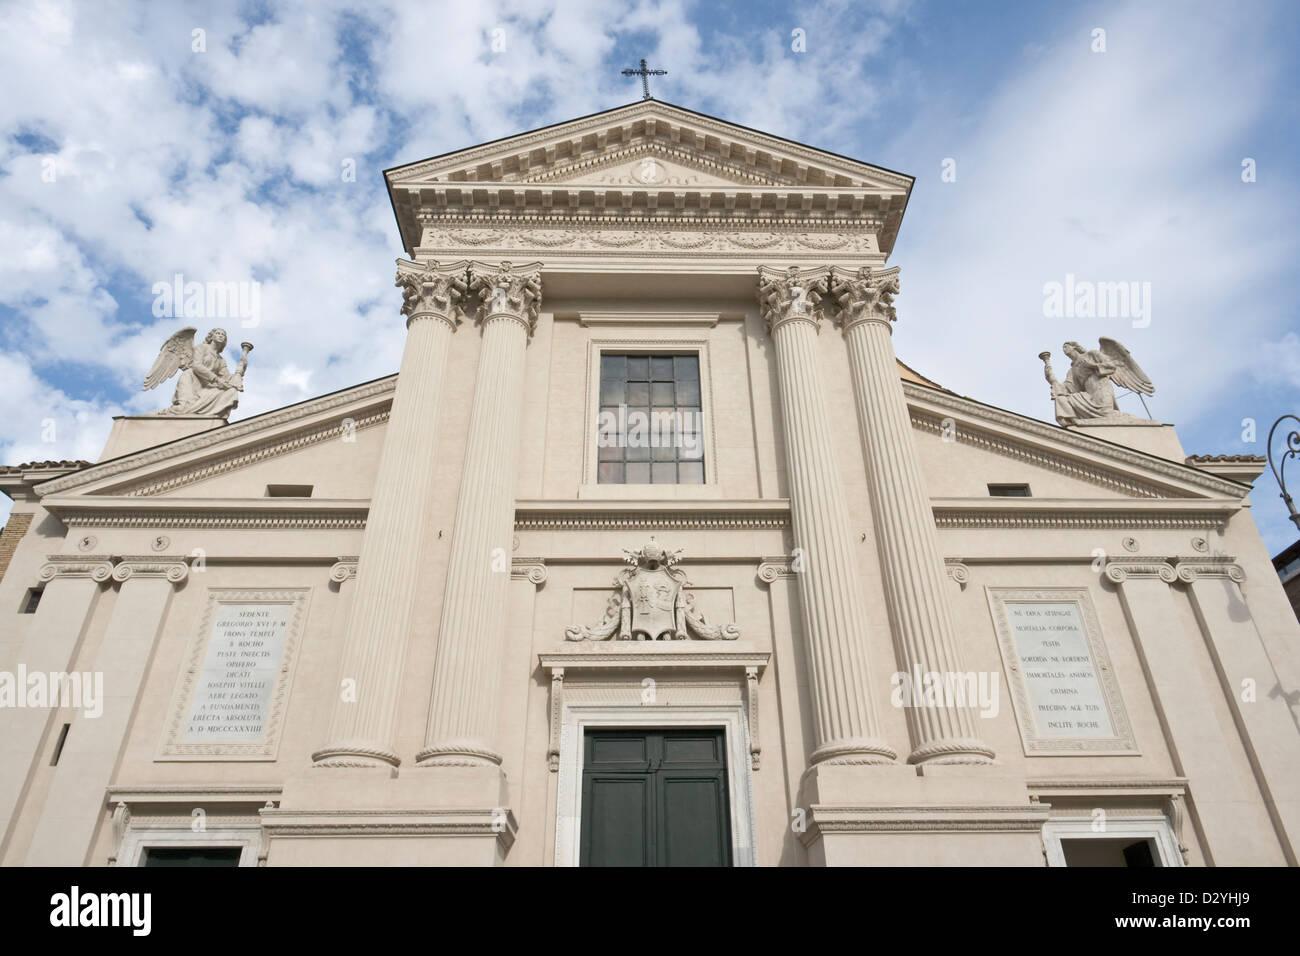 San Rocco church, Rome - Stock Image